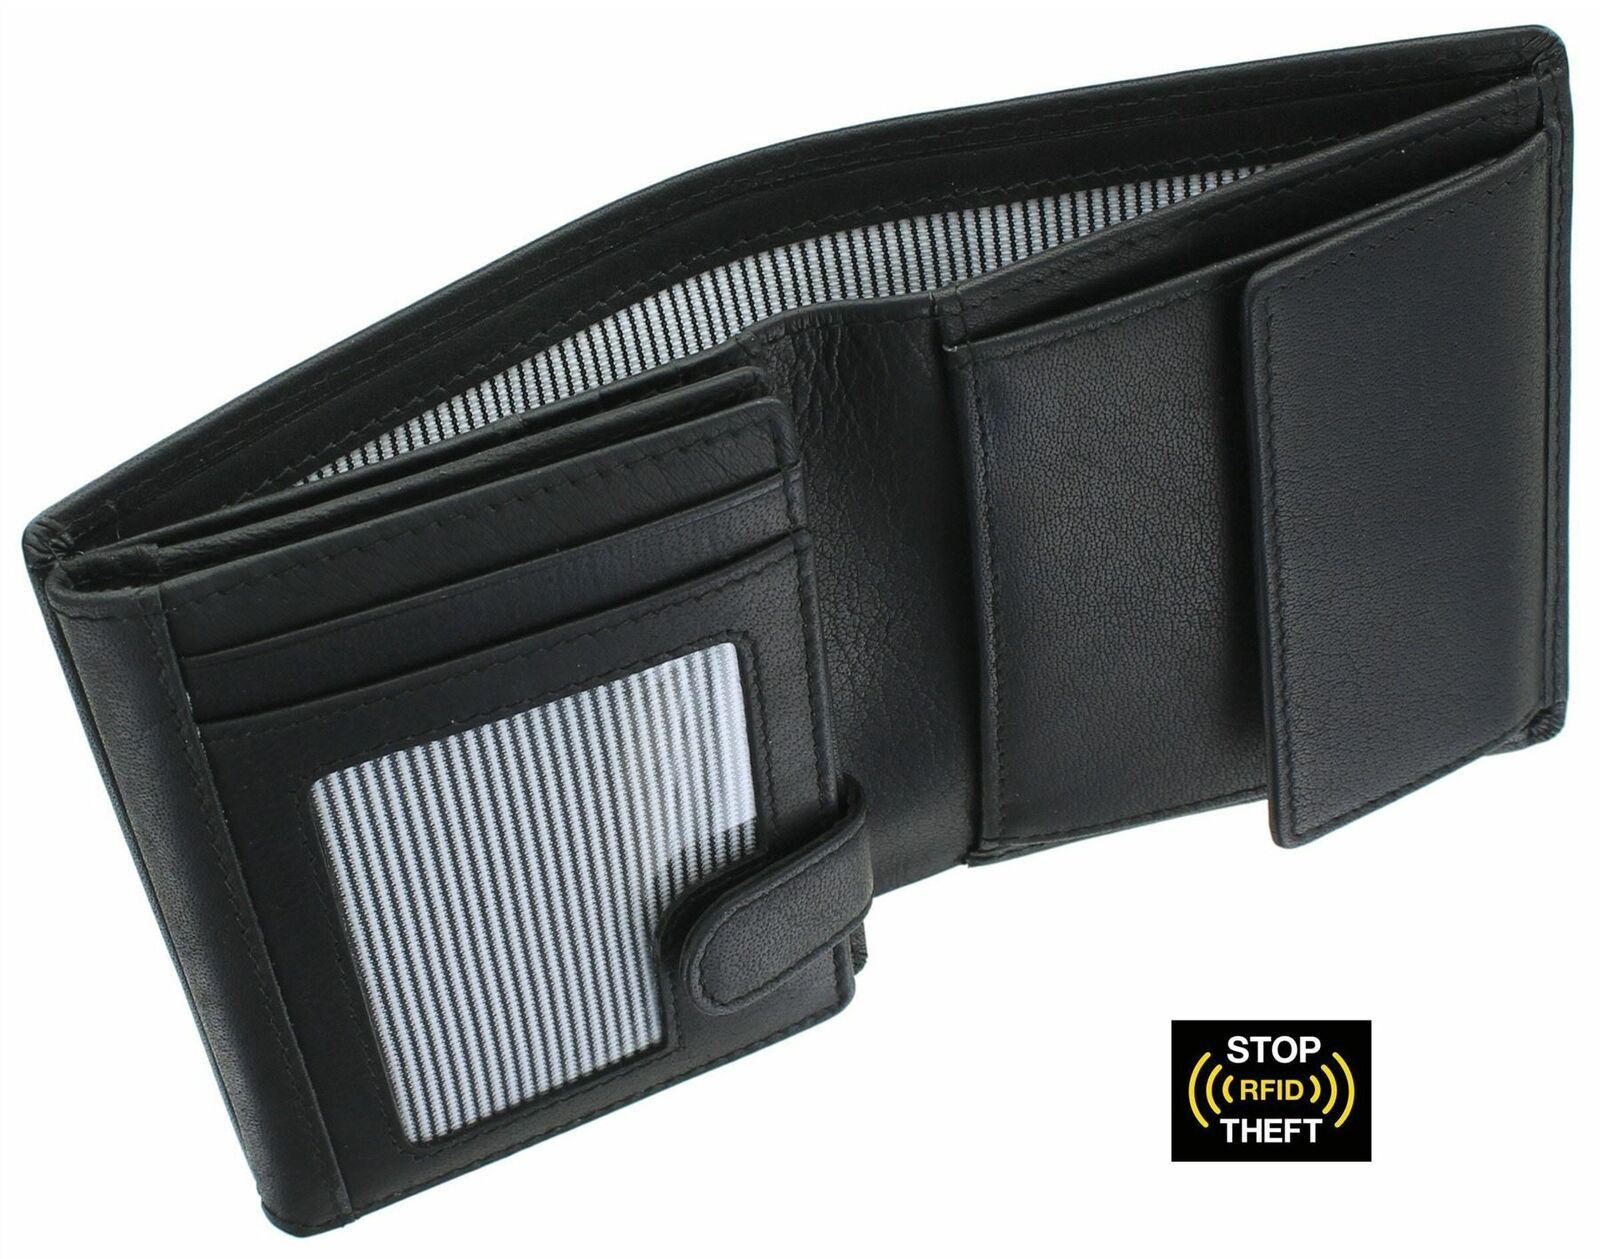 Kalmin Shaftsbury Collection Leather Wallet RFID Blocking 1020_30